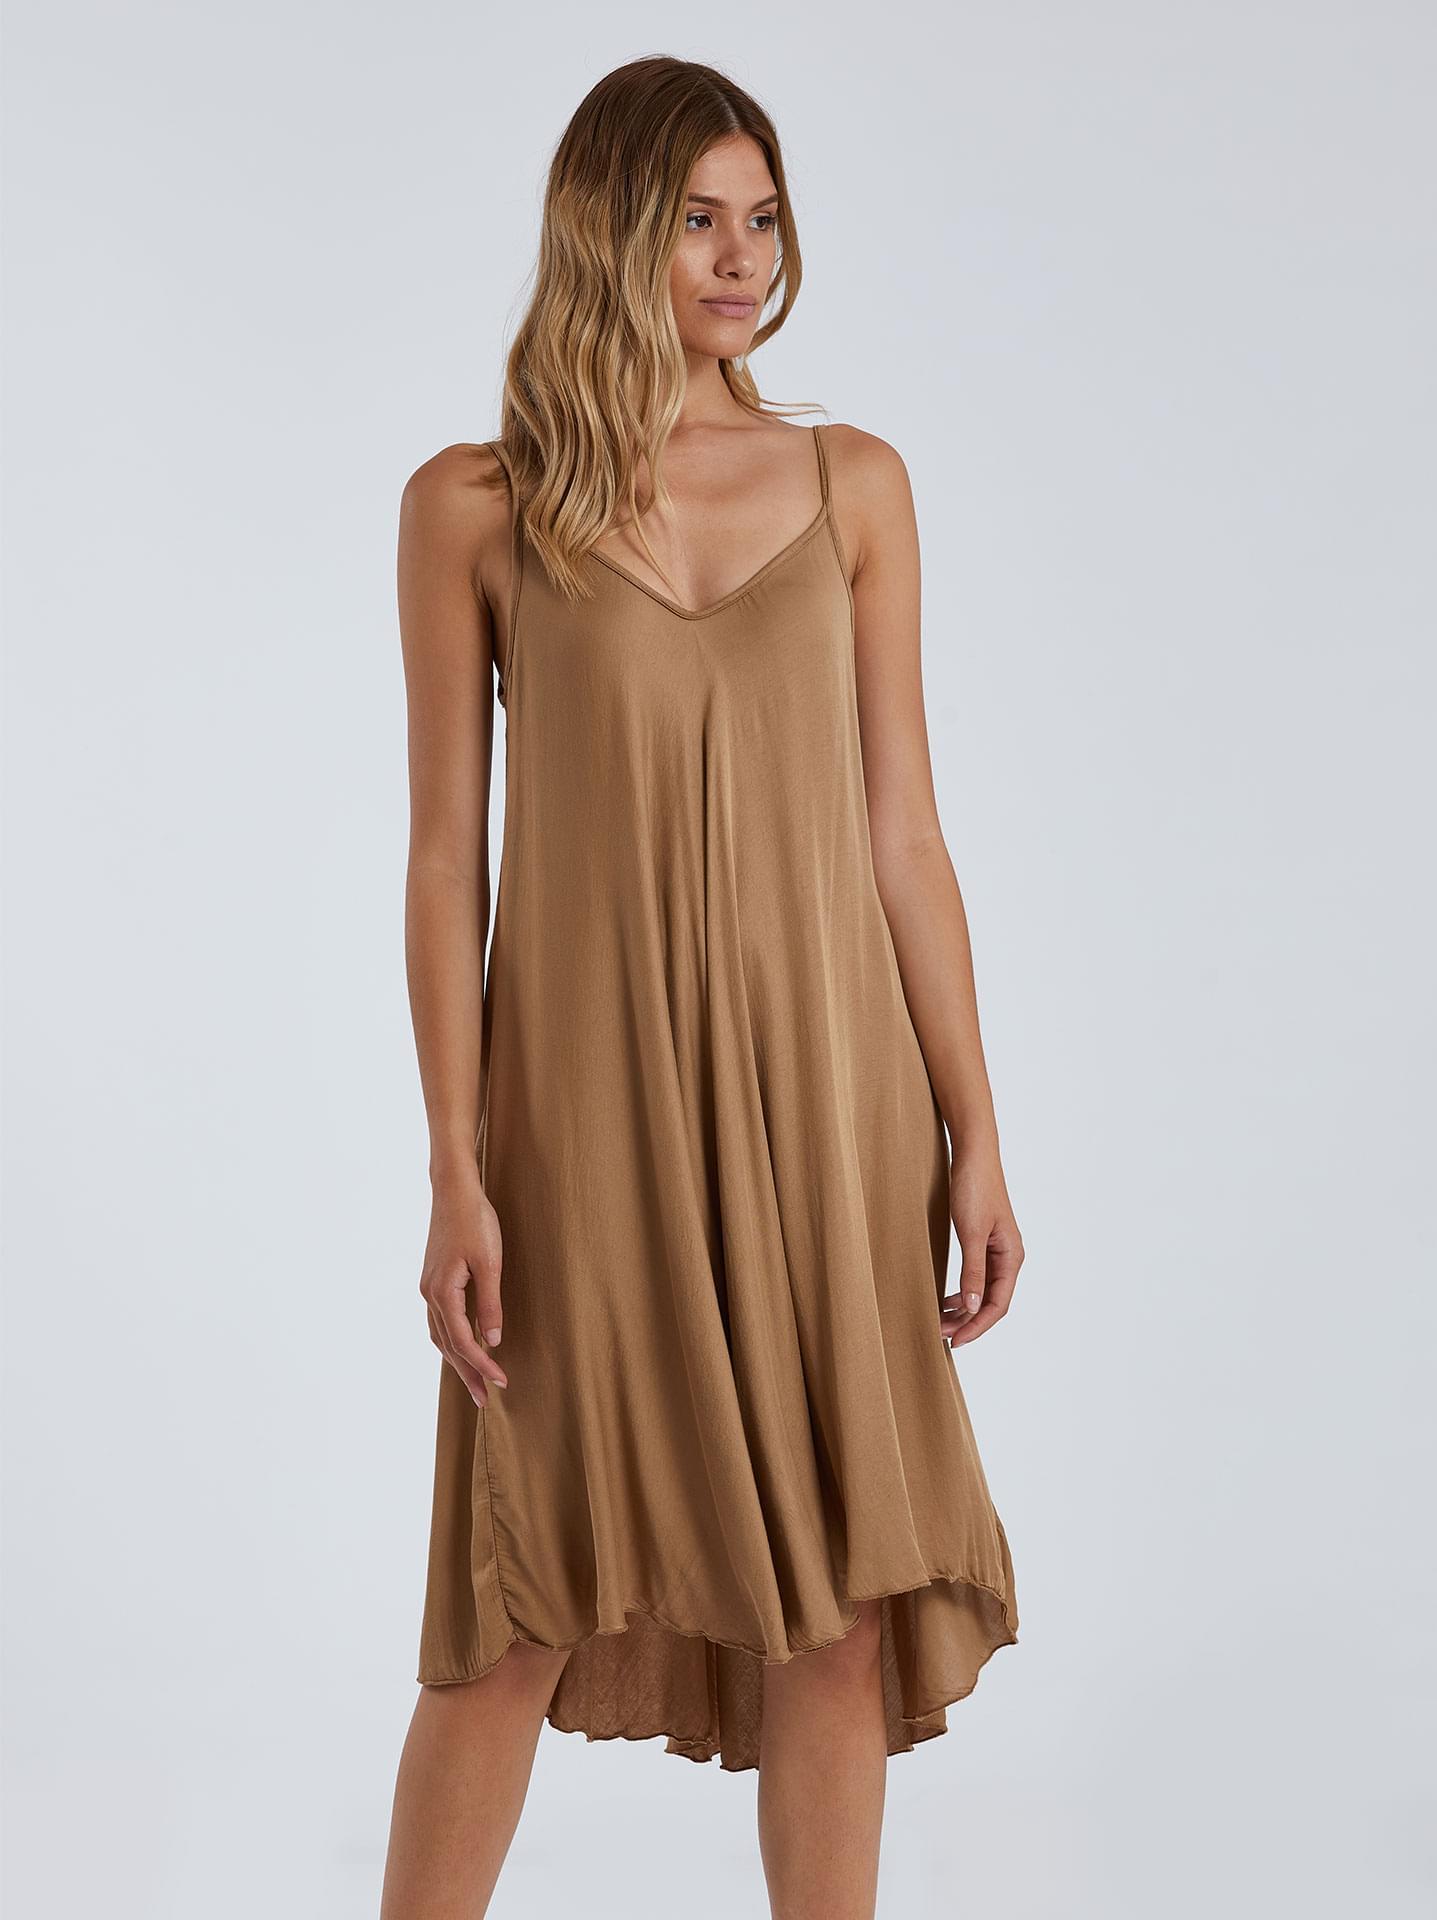 Midi φόρεμα με v λαιμόκοψη σε καμηλο, 11,95€ | Celestino